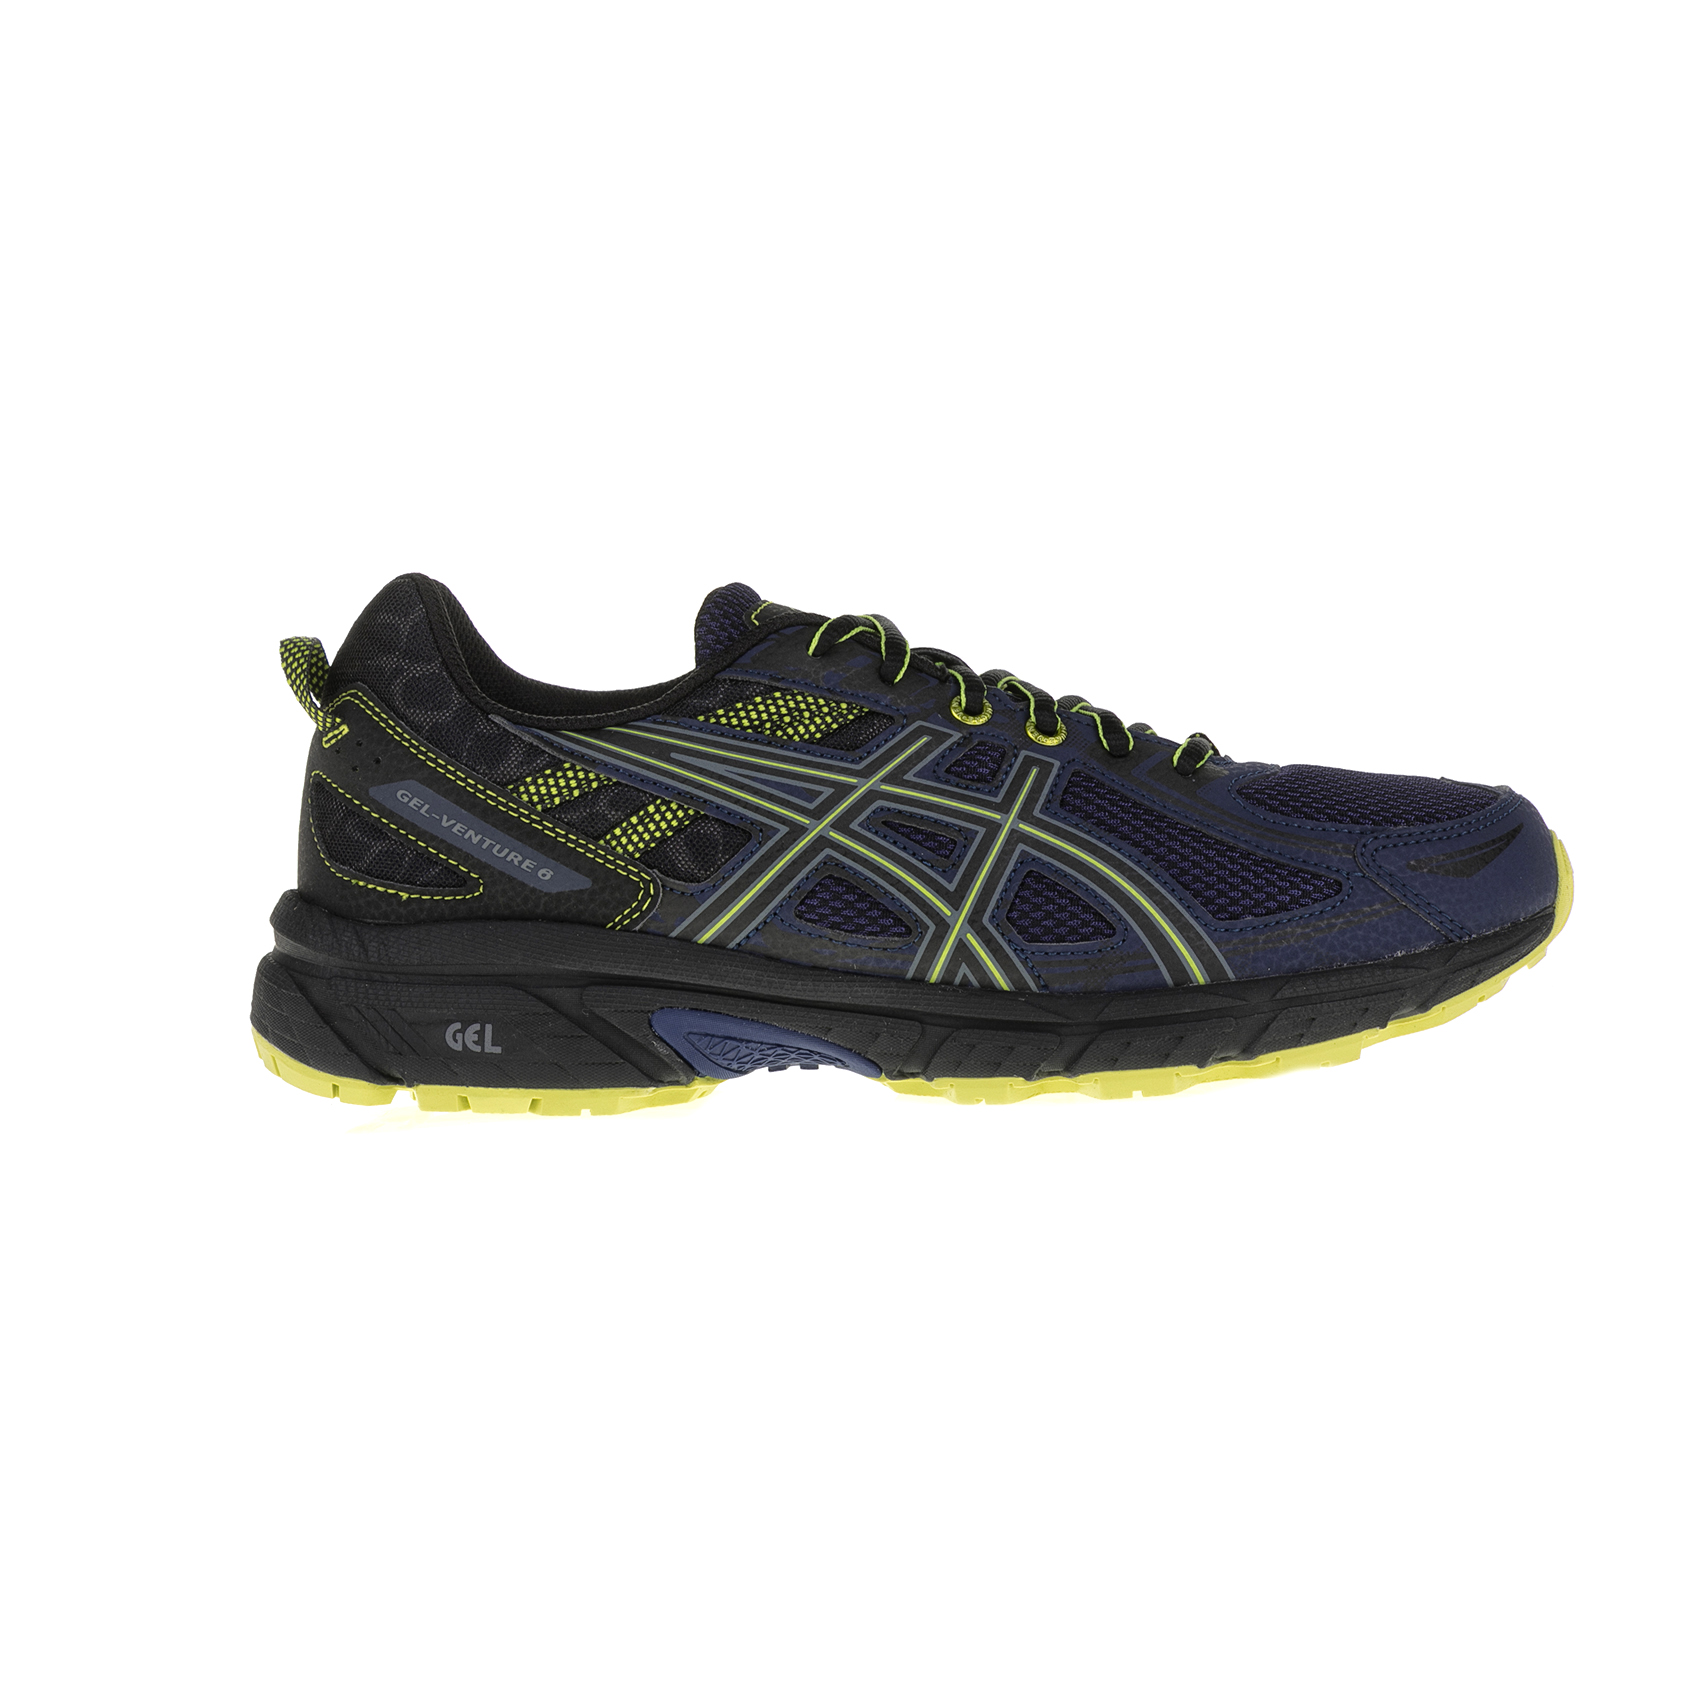 ASICS – Ανδρικά αθλητικά παπούτσια ASICS GEL-VENTURE 6 GS μαύρα-μπλε